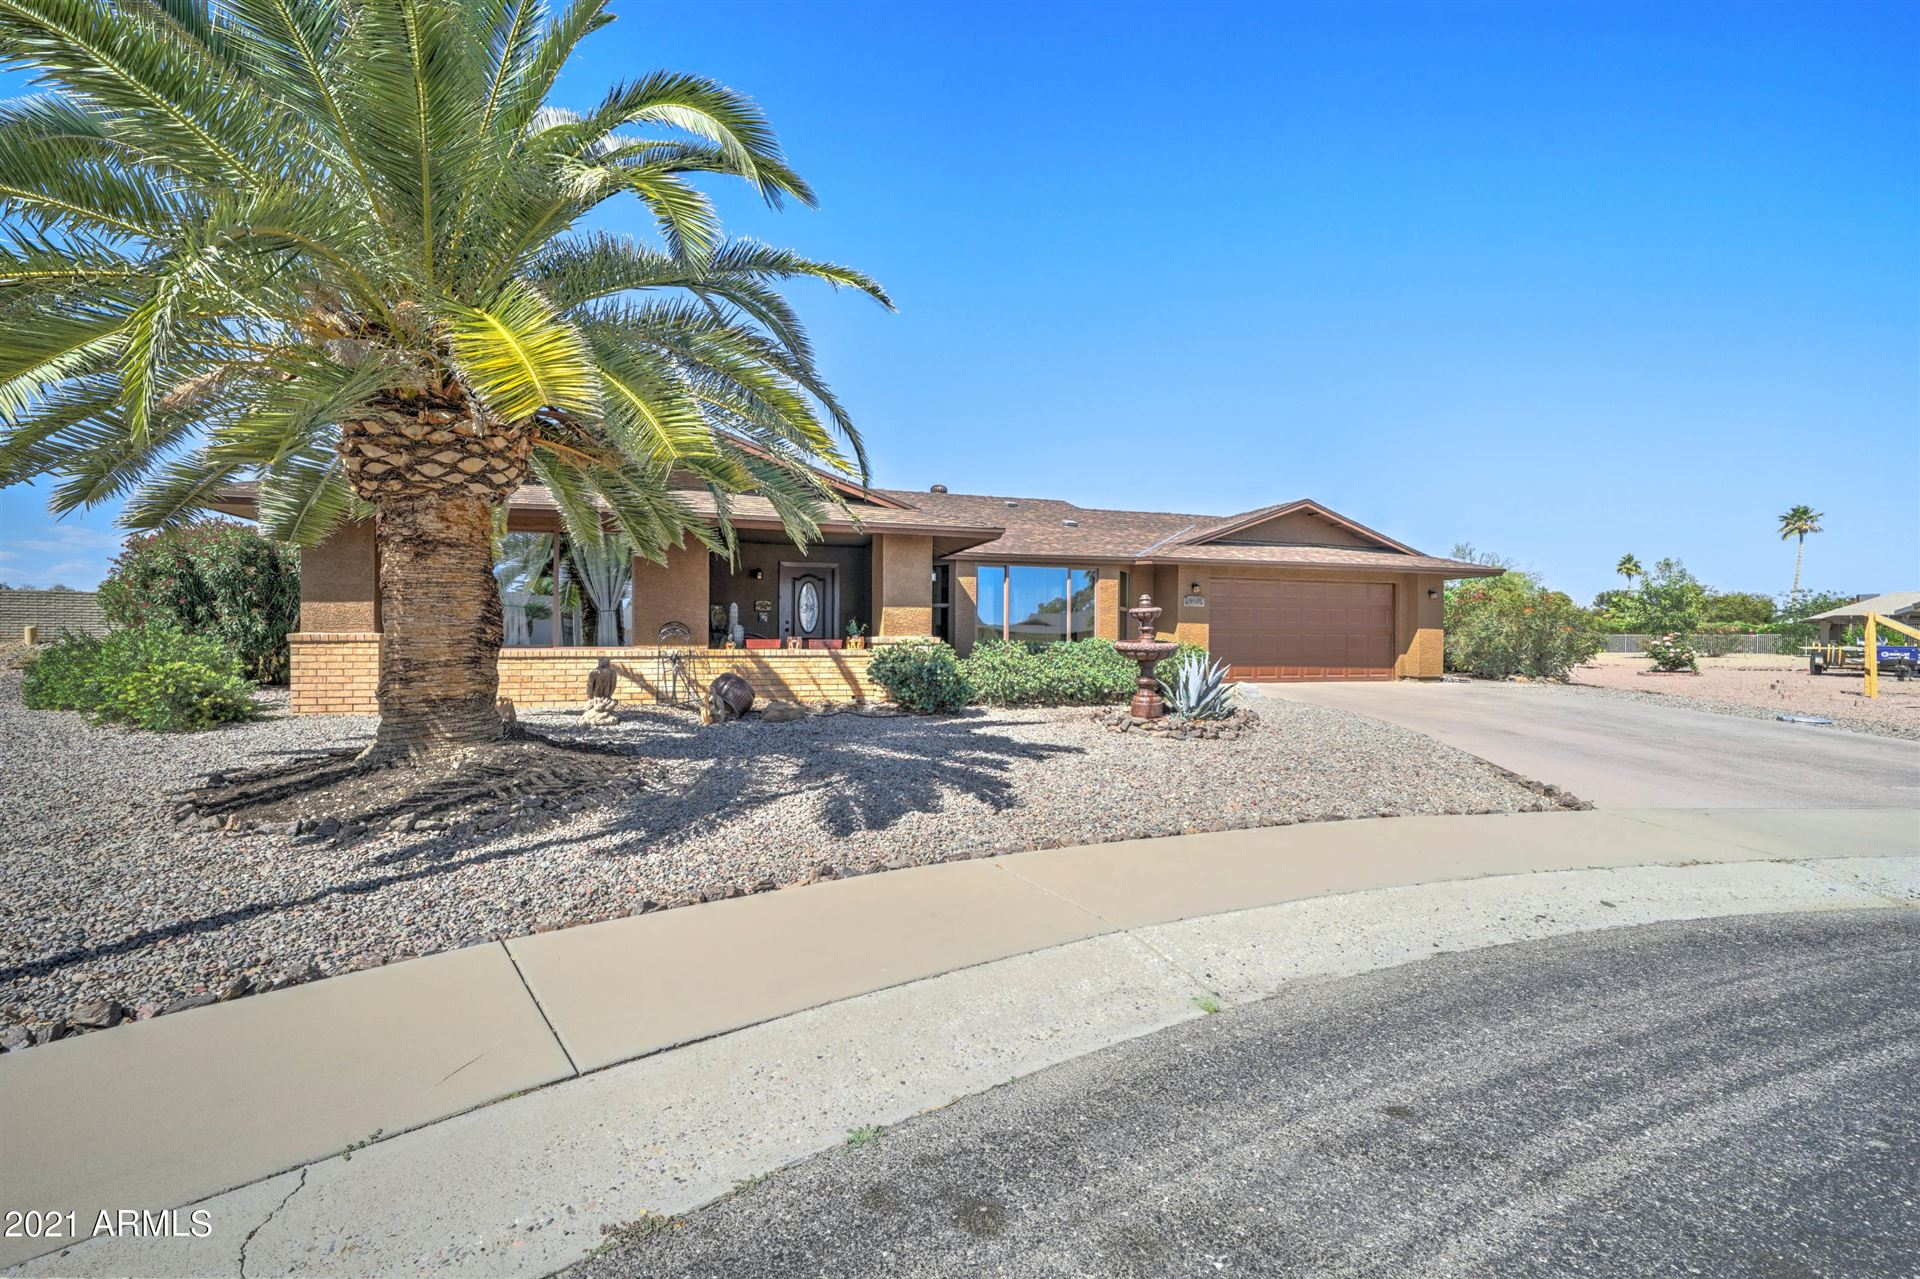 Photo of 13426 W BALLAD Drive, Sun City West, AZ 85375 (MLS # 6230922)